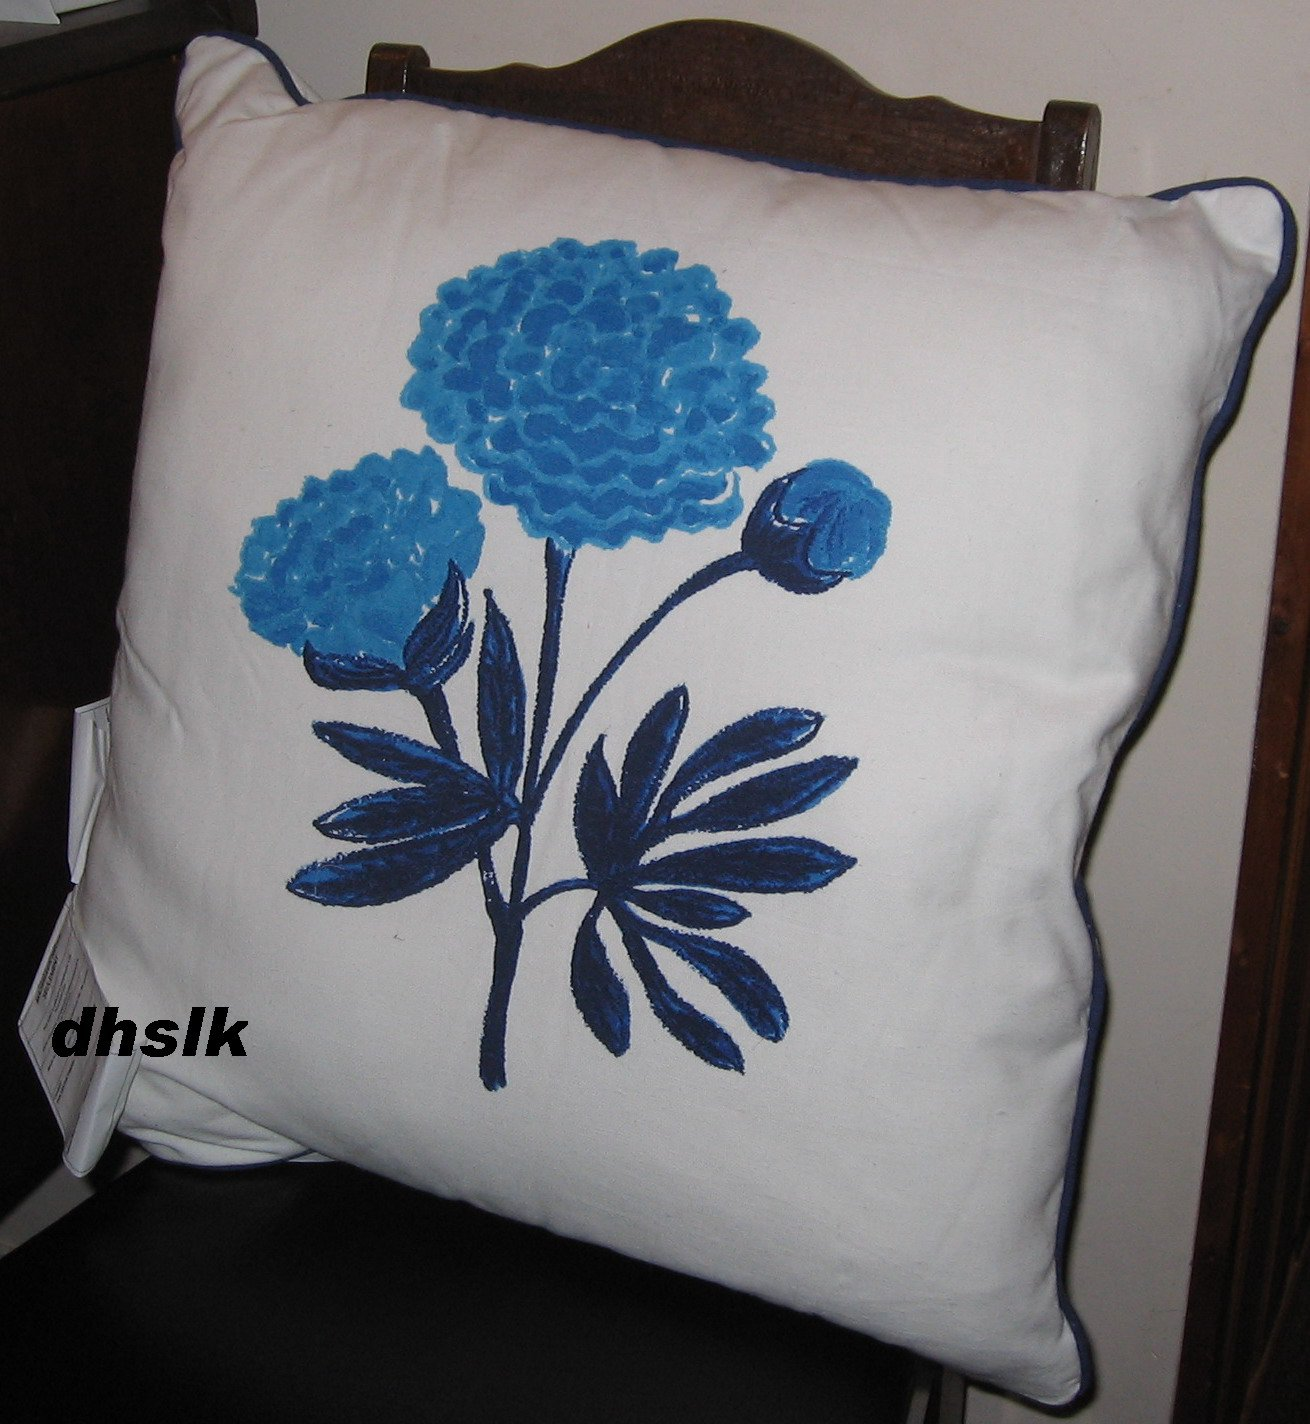 IKEA GRONSKA Grönska CUSHION Accent Pillow BLUE FLOWER Striped Sommar 2018